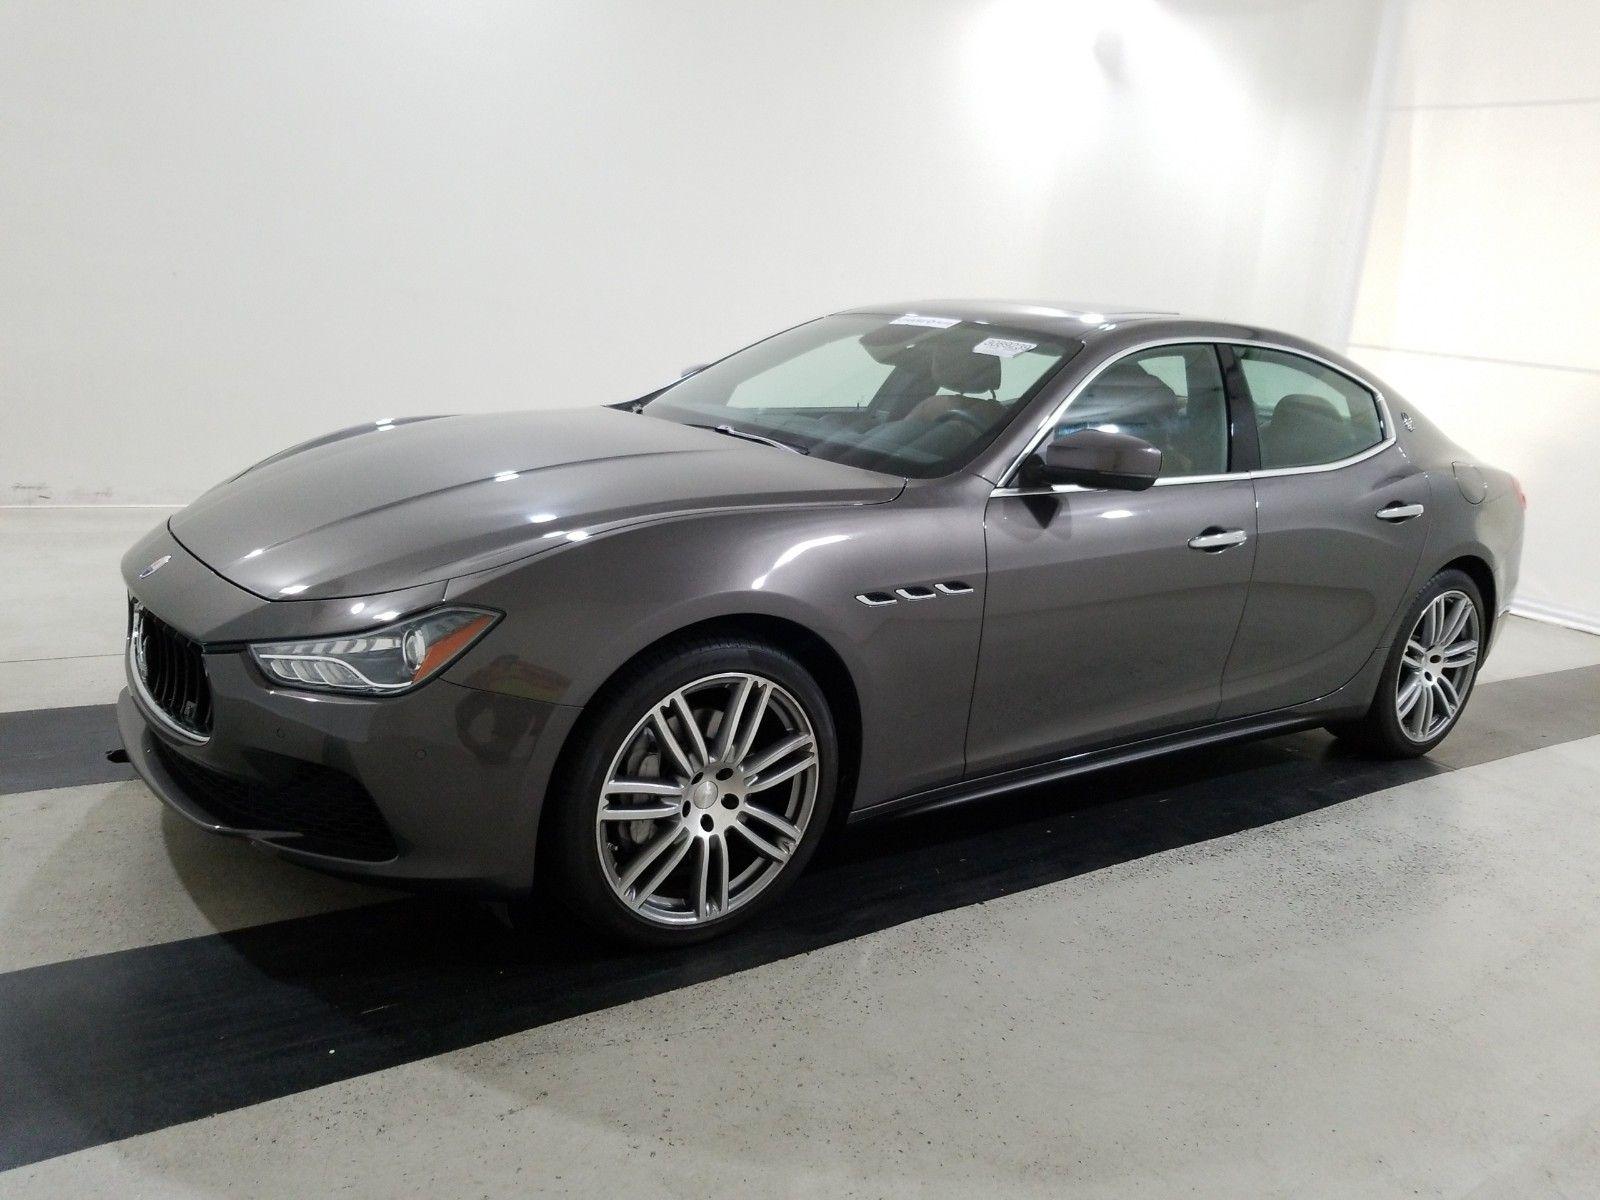 2017 Maserati Ghibli 3.0. Lot 99913806551 Vin ZAM57XSA2H1213713